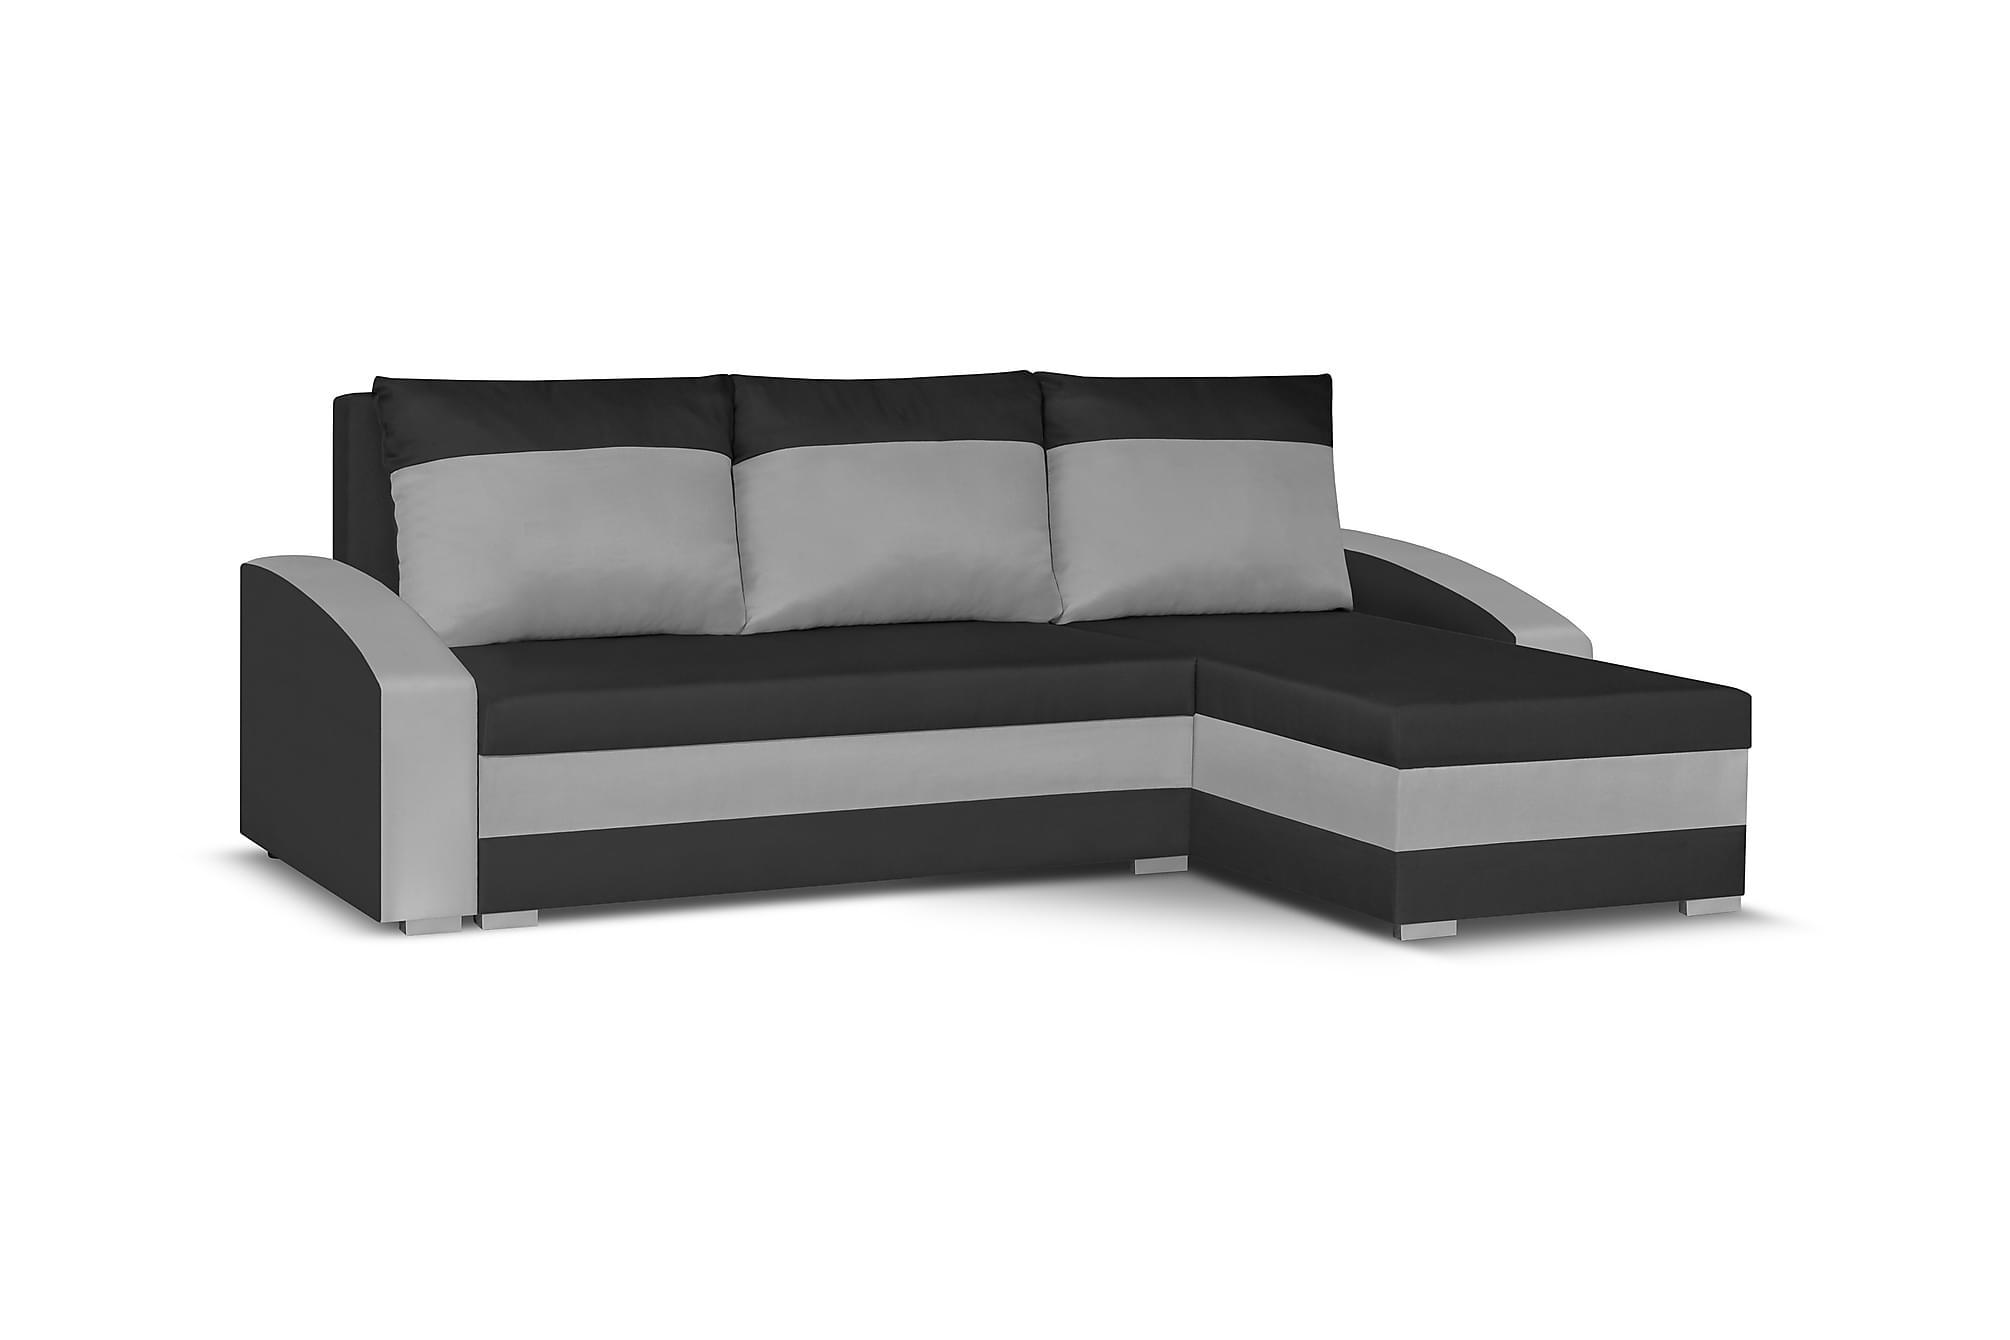 Banyoles divanbäddsoffa svart/grå